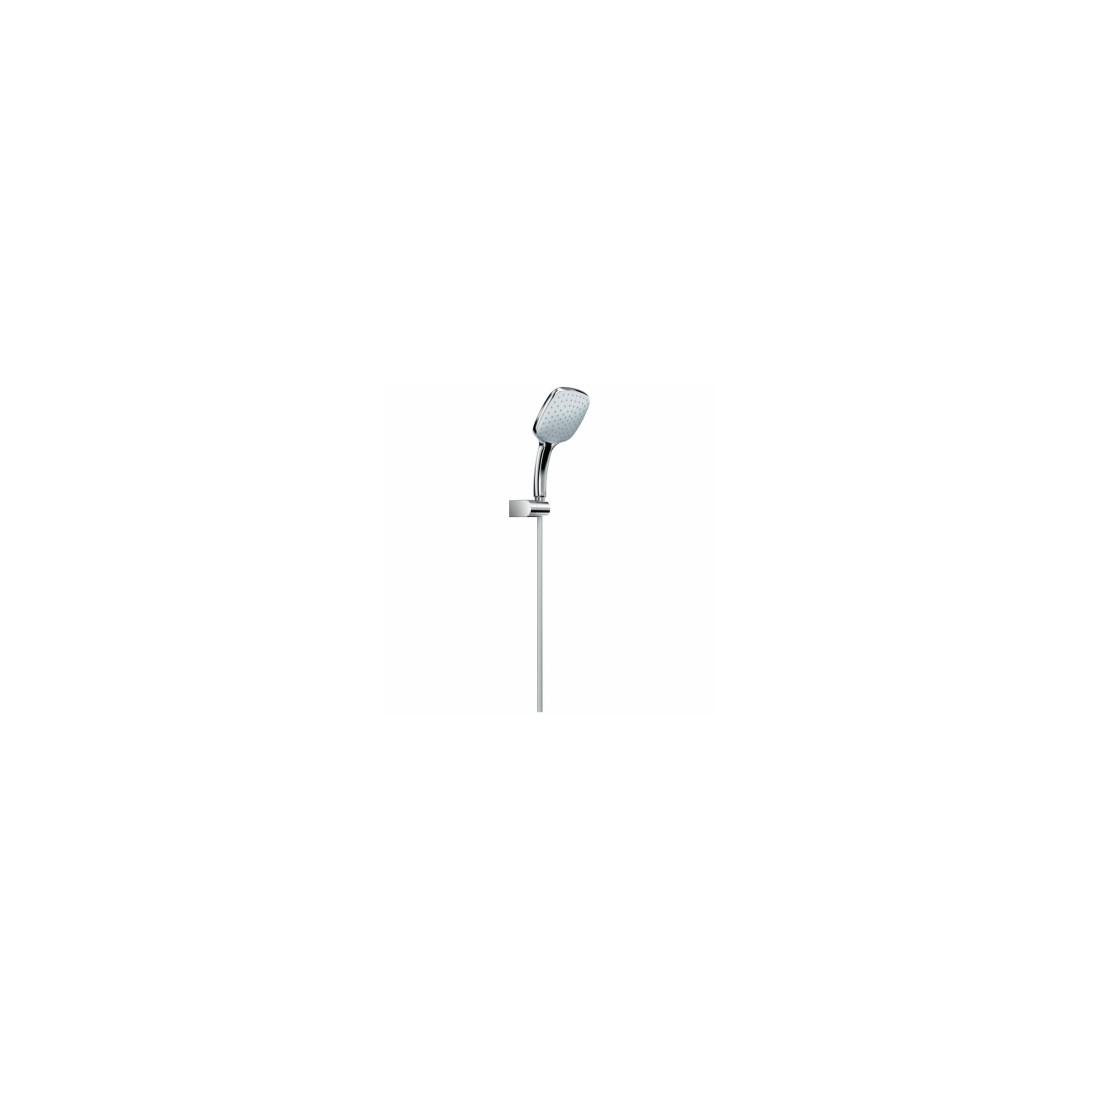 Dušo komplektas Ideal Standard IdealRain, Cube M1, galvutė 100 mm